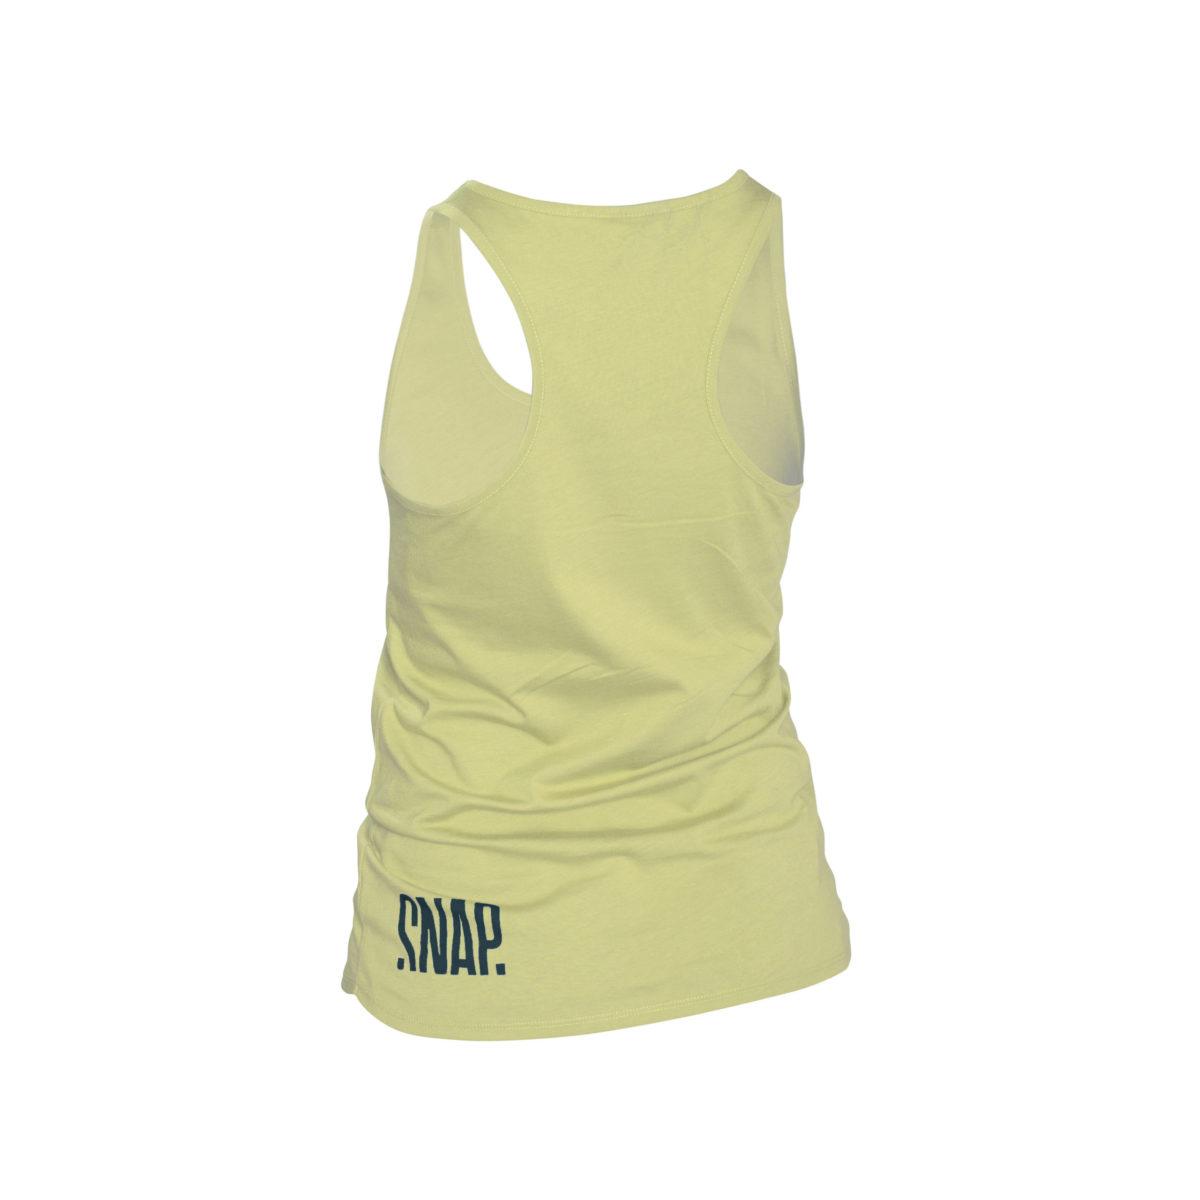 yellow top sportswear style